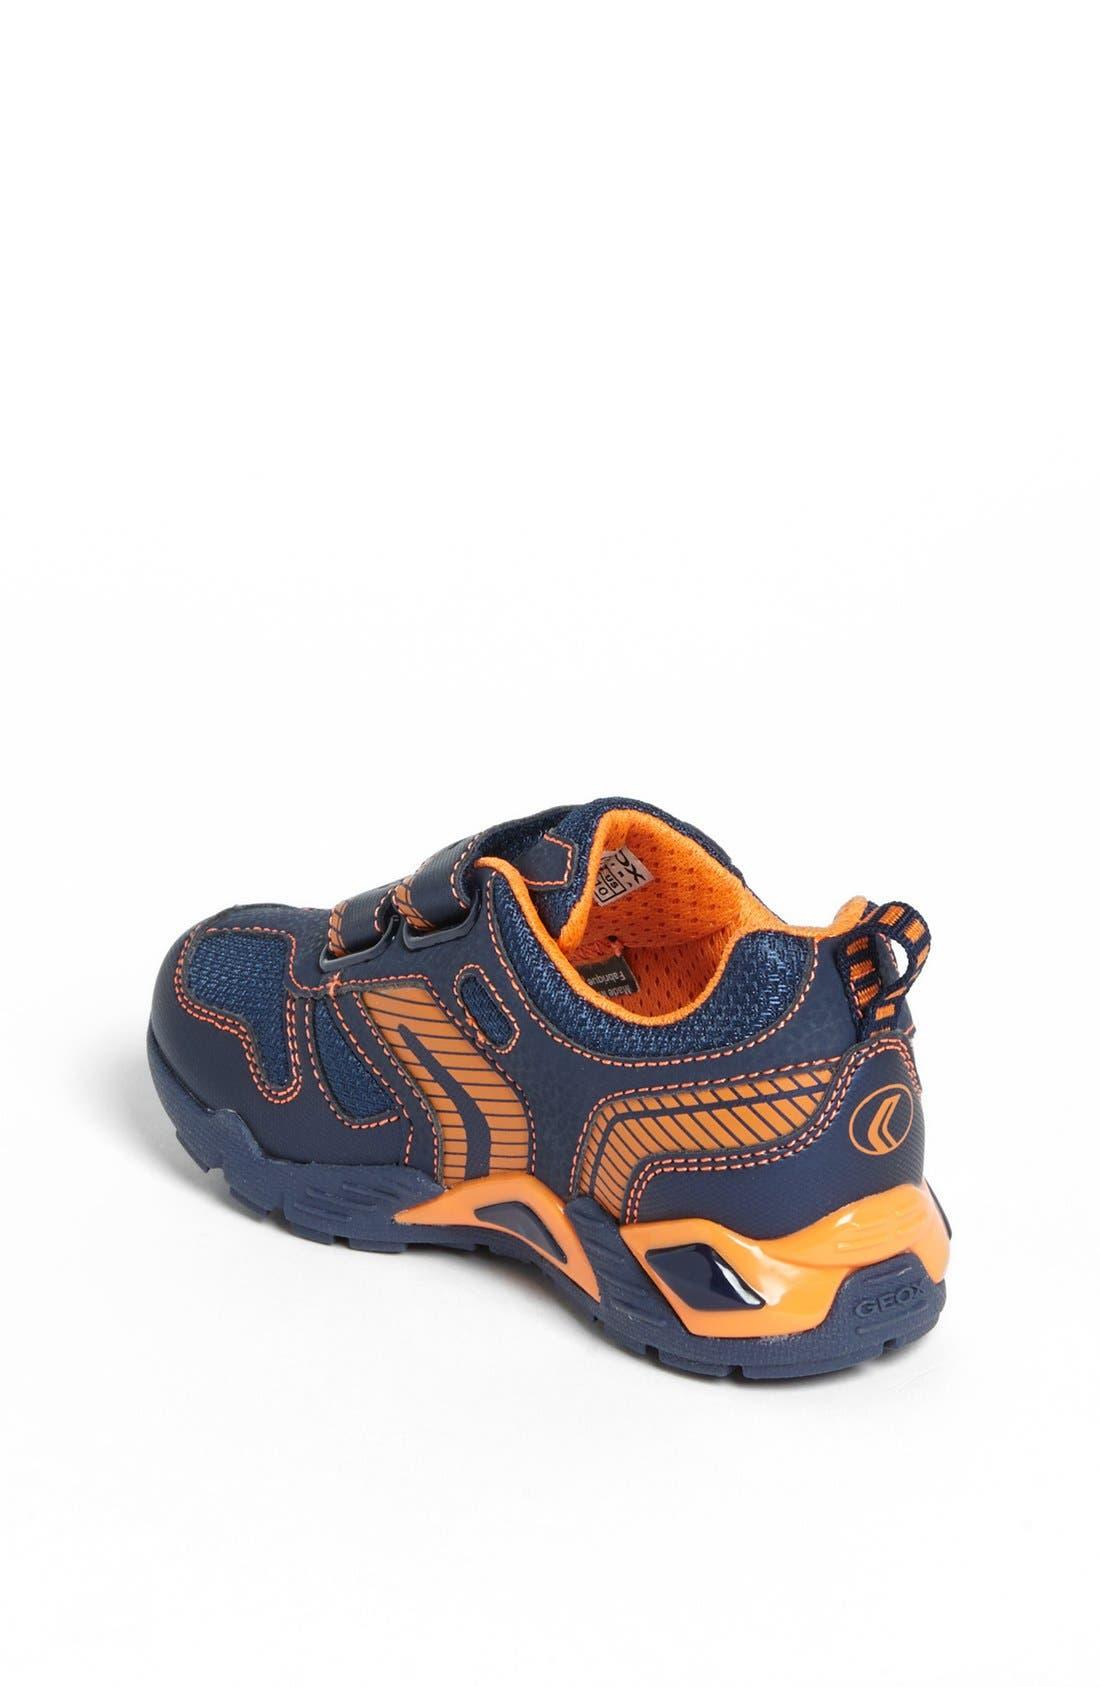 Alternate Image 2  - Geox 'Supreme' Light-Up Sneaker (Toddler, Little Kid & Big Kid)